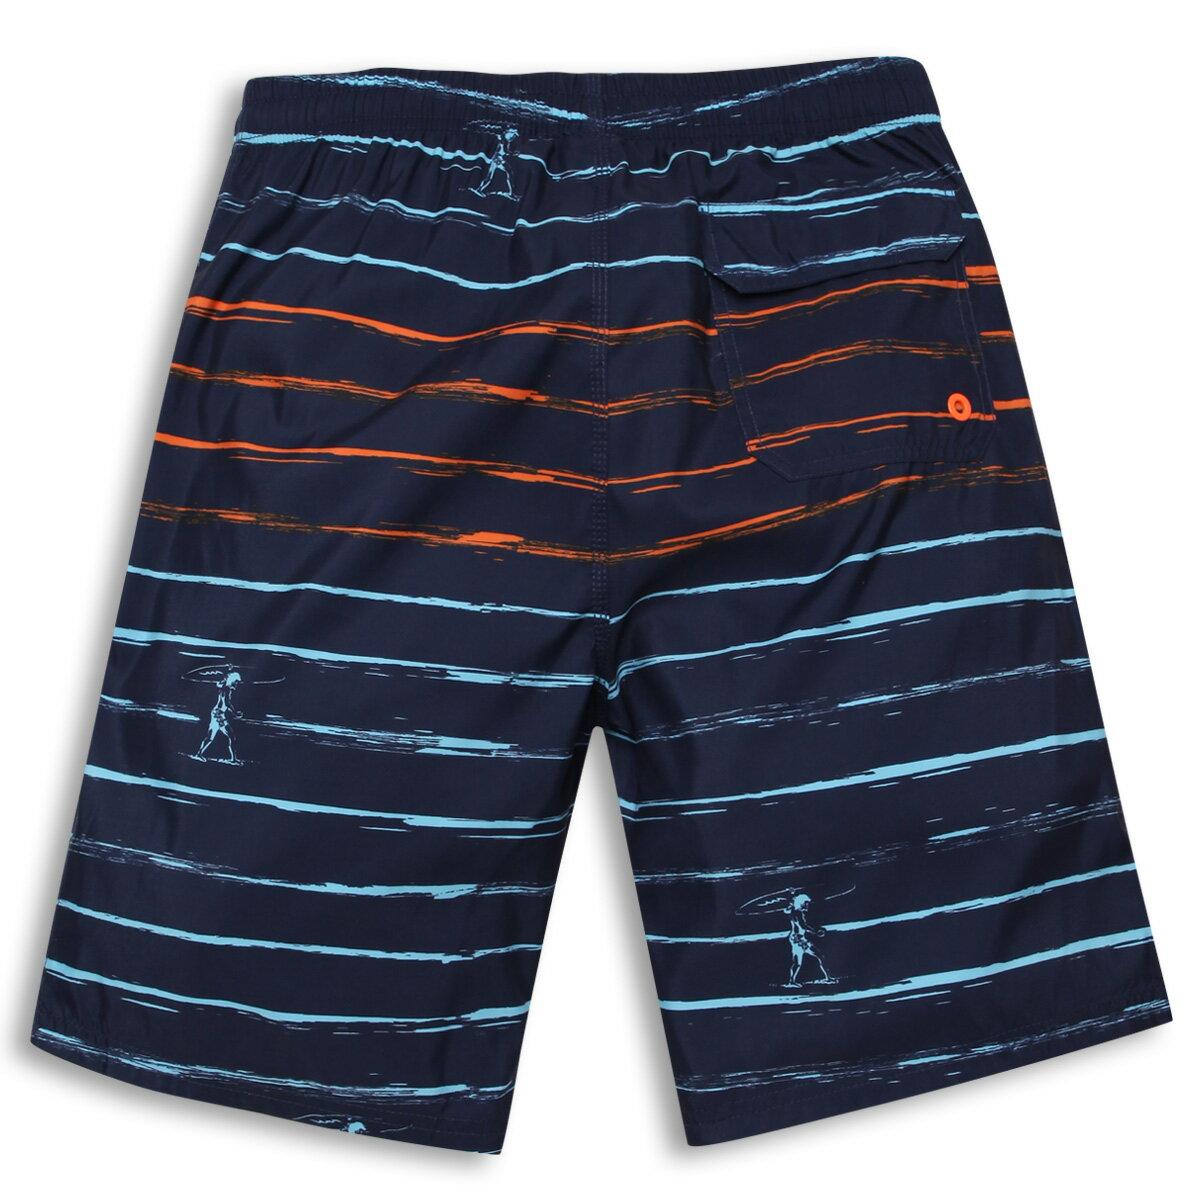 GAILANG(ガイラング)水着メンズ海パン海パン海水パンツサーフサーフパンツサーフショーツ海水浴プール温泉大きいサイズ旅行海外旅行